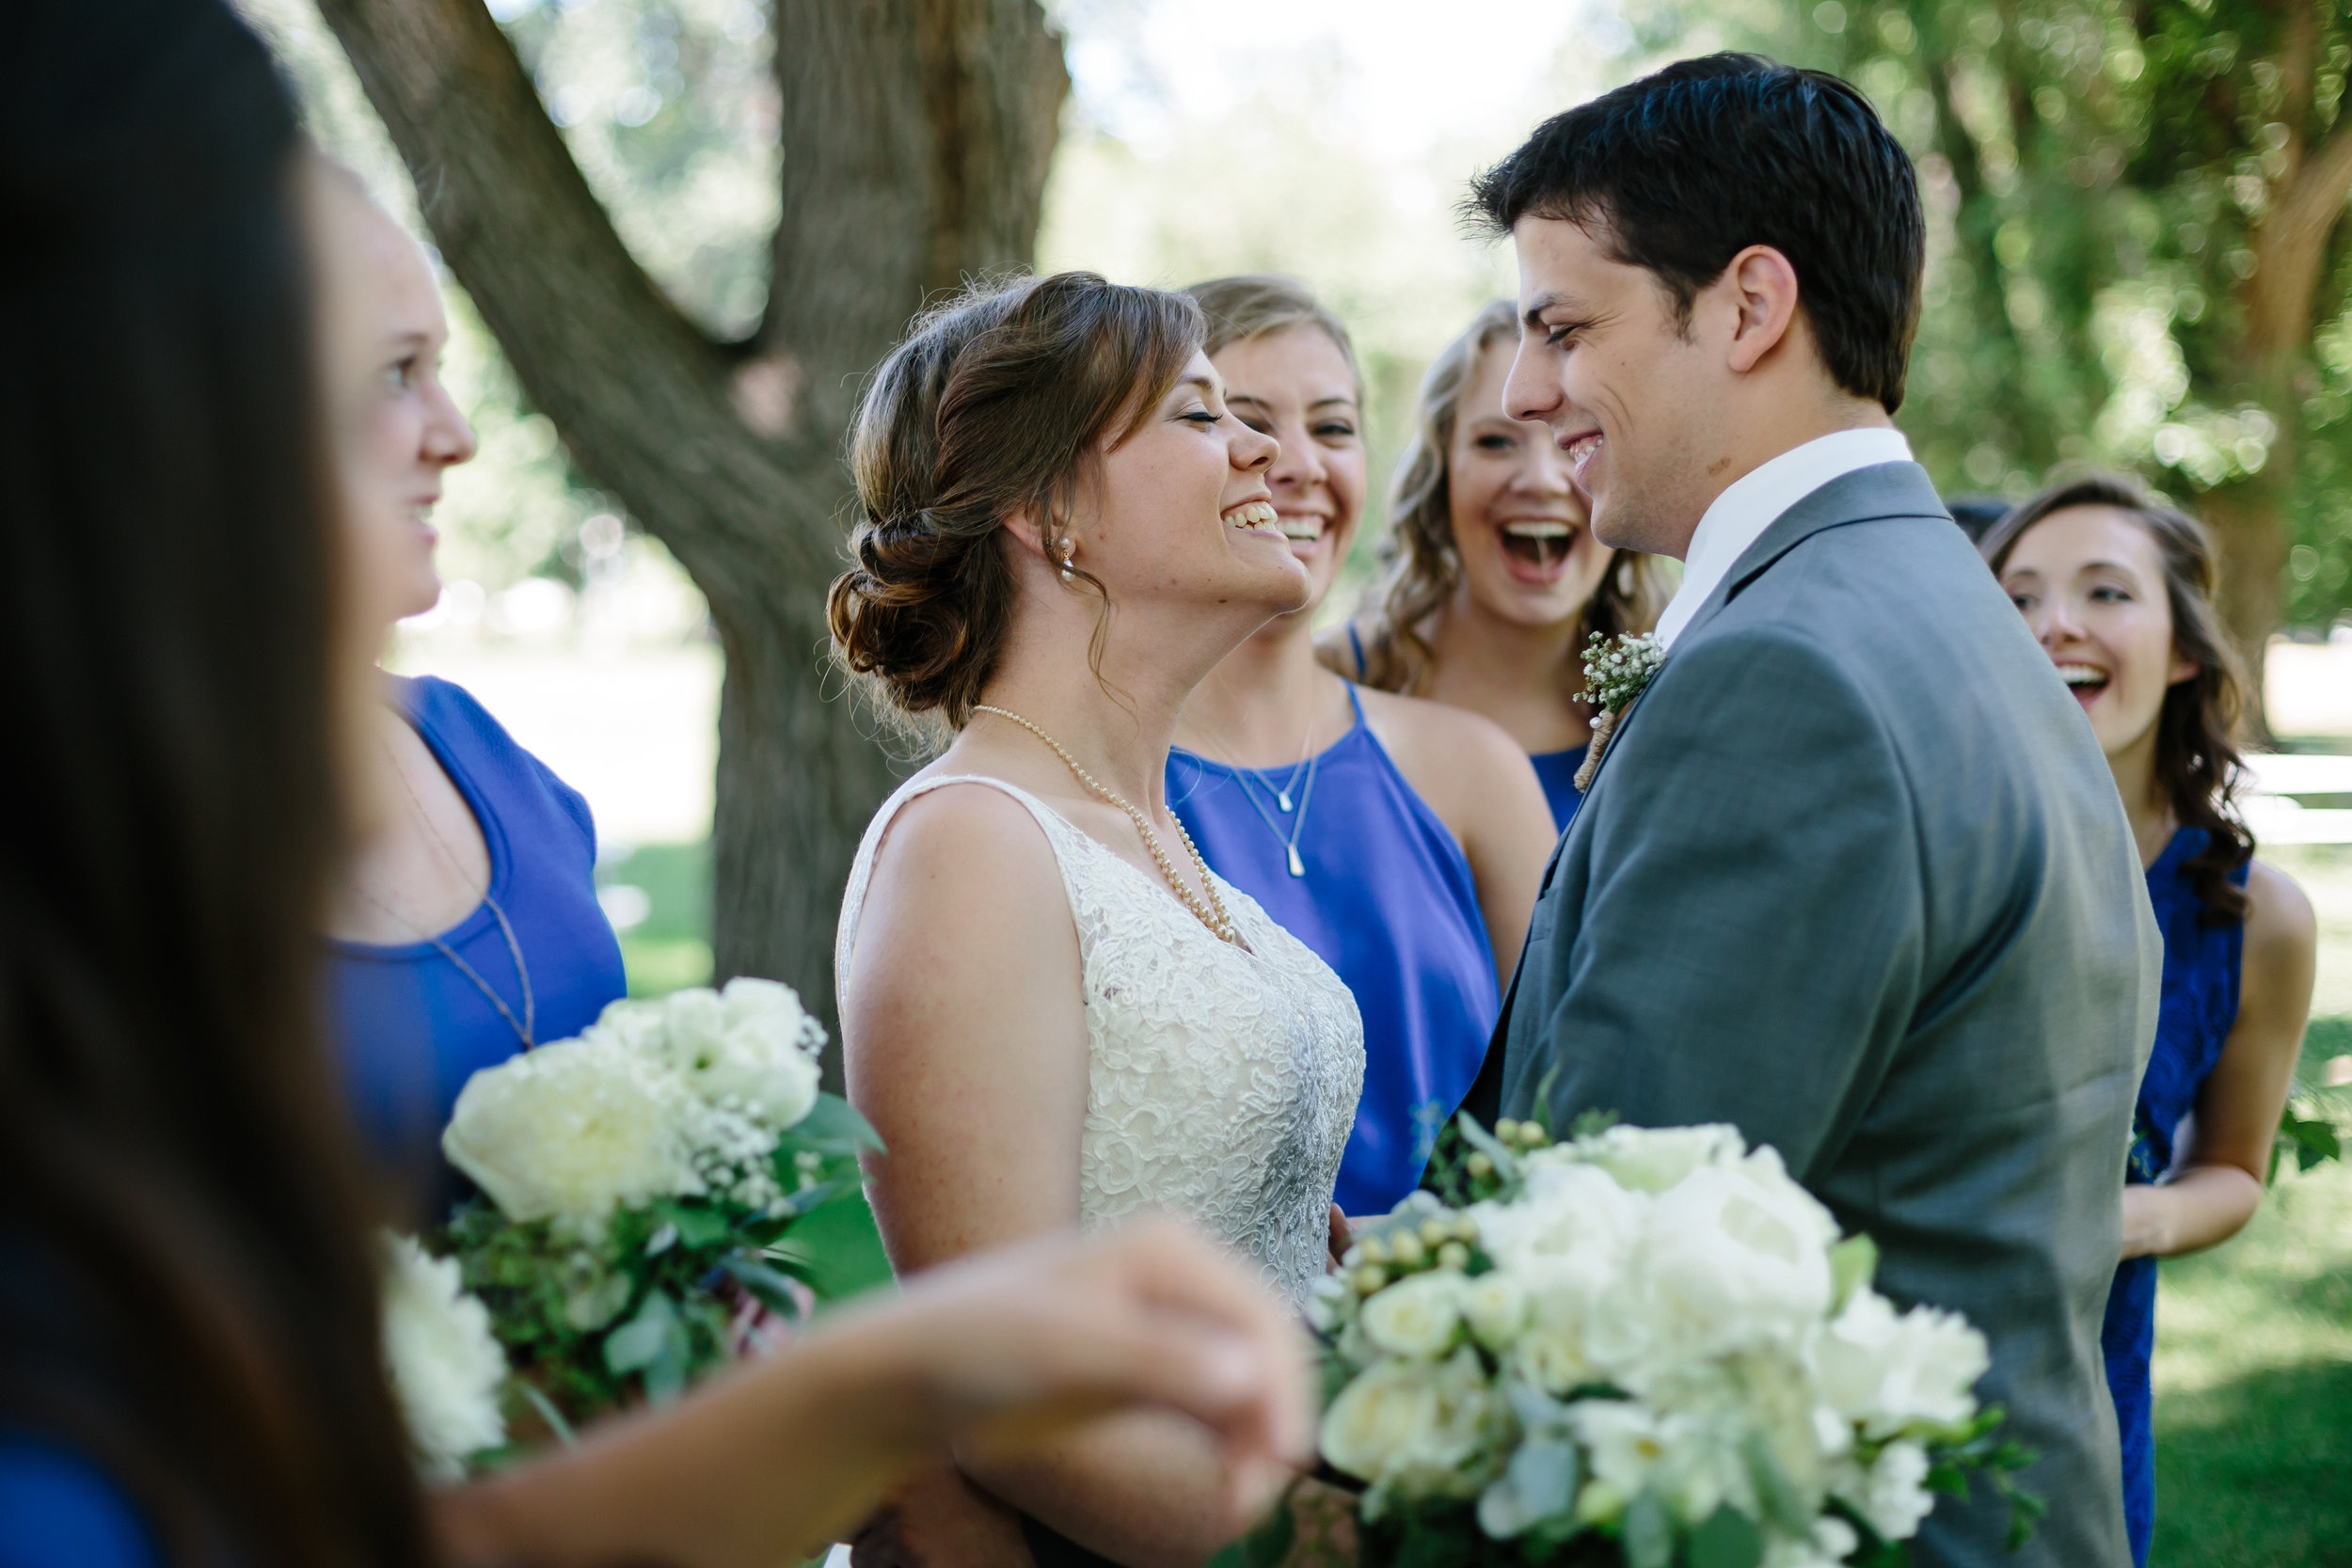 Jordan & Shantel Married - Idaho - Corrie Mick Photography-151.jpg